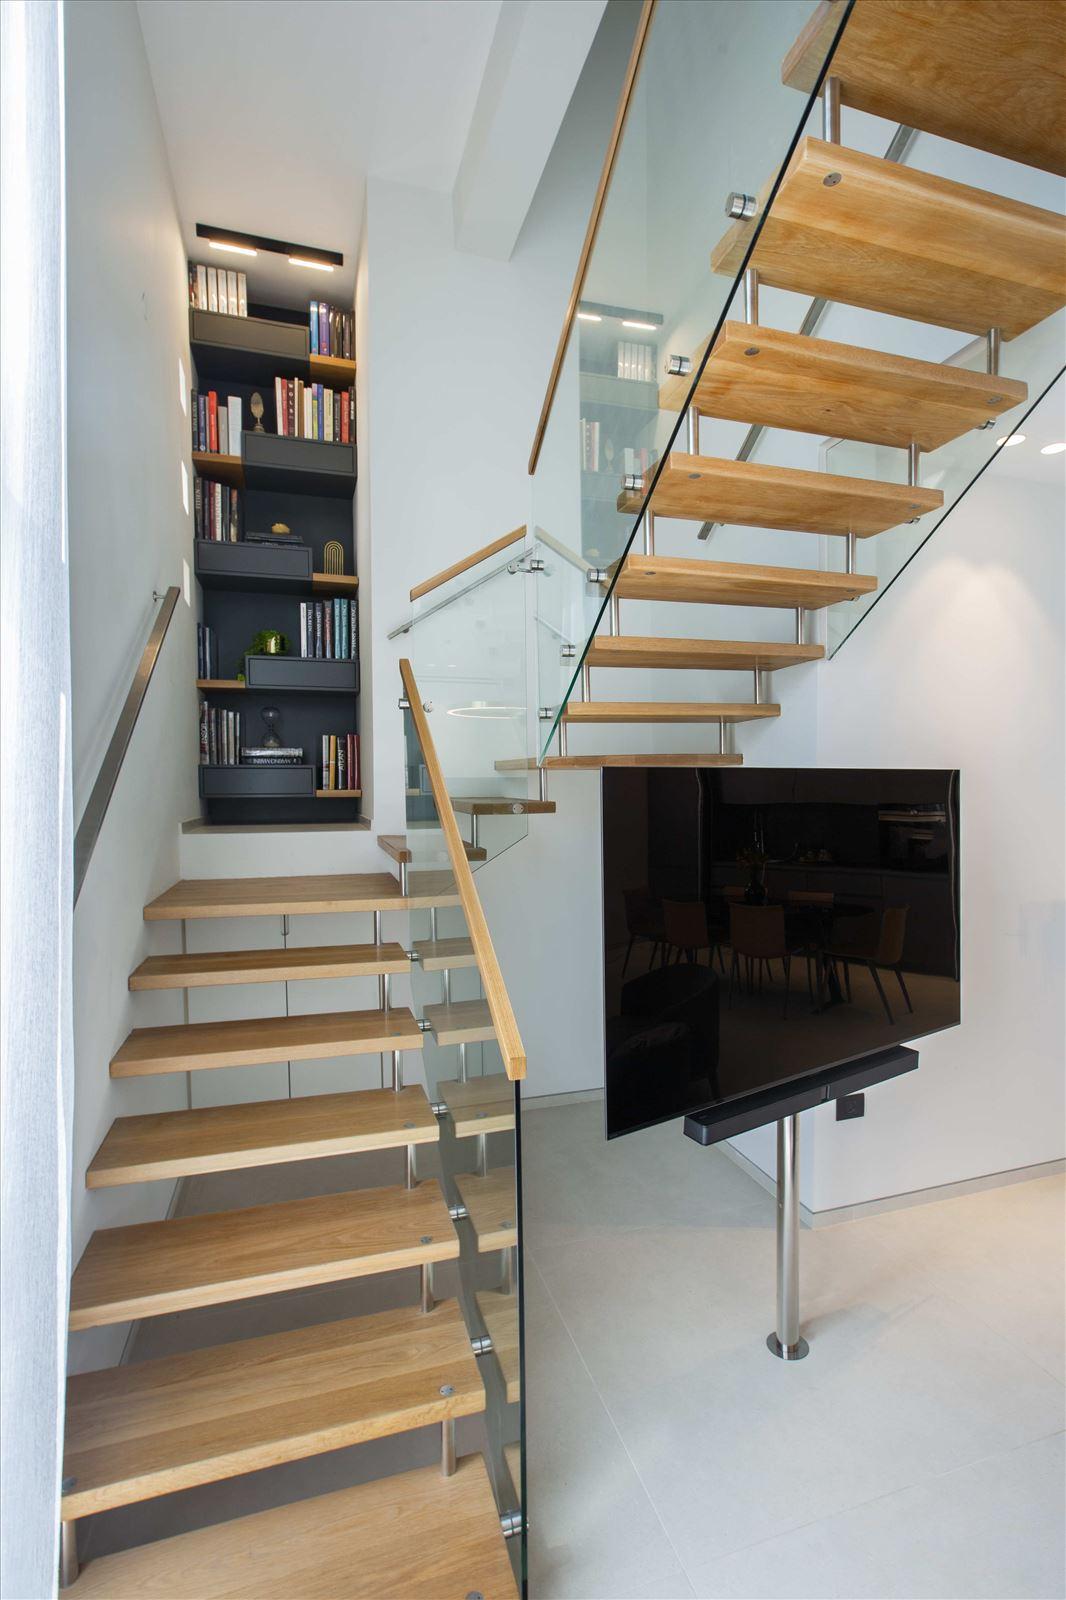 Tel Aviv apartment in Parisian aroma תאורת מדרגות על ידי קמחי דורי